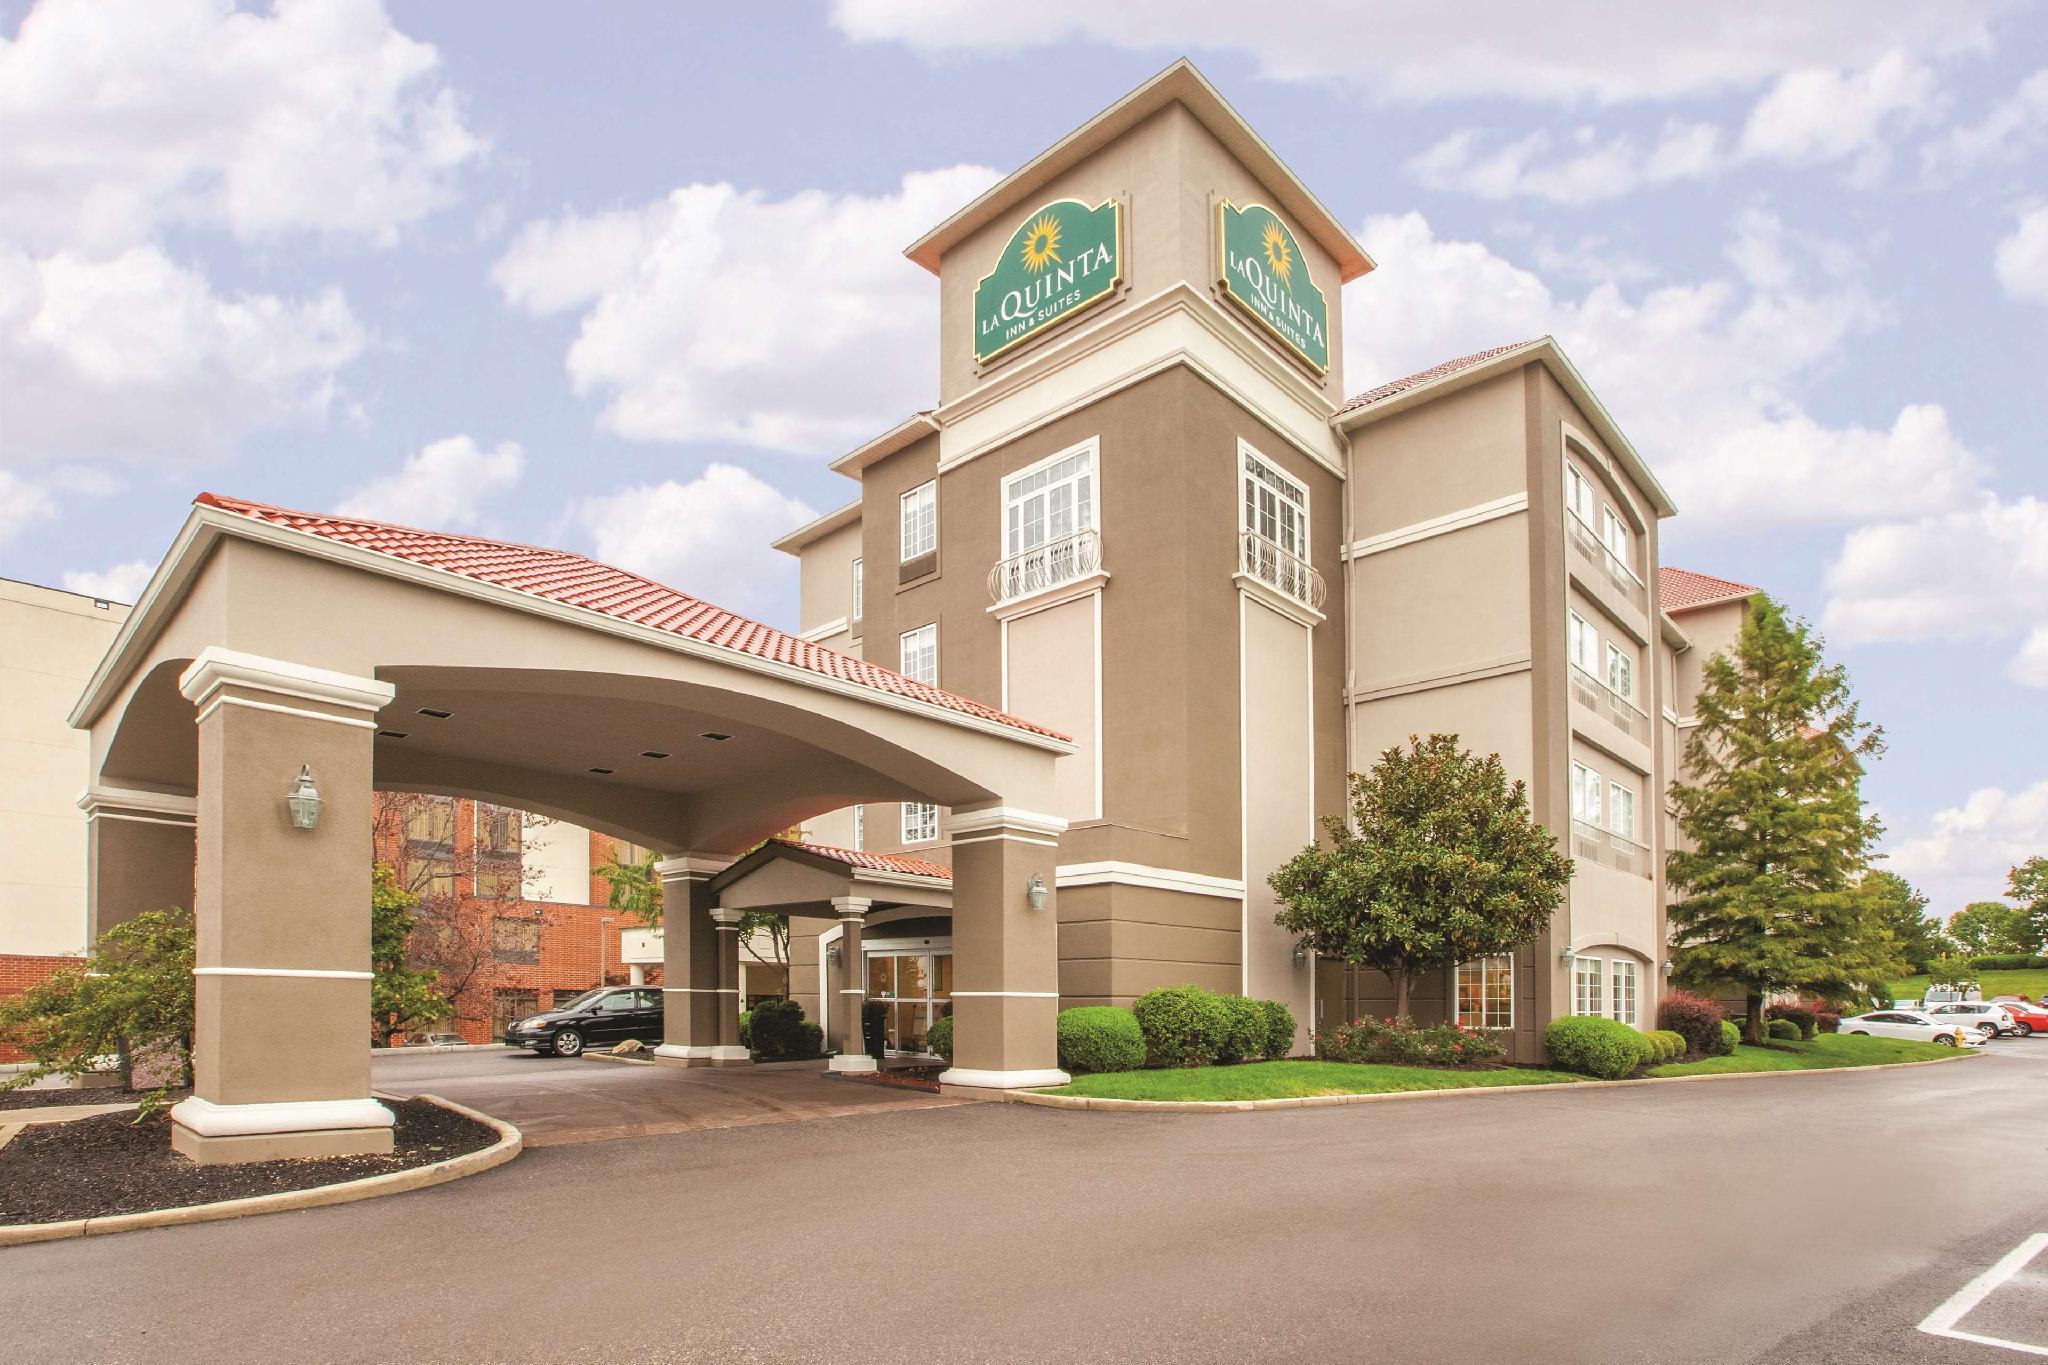 La Quinta Inn And Suites By Wyndham Cincinnati Airpt Florence